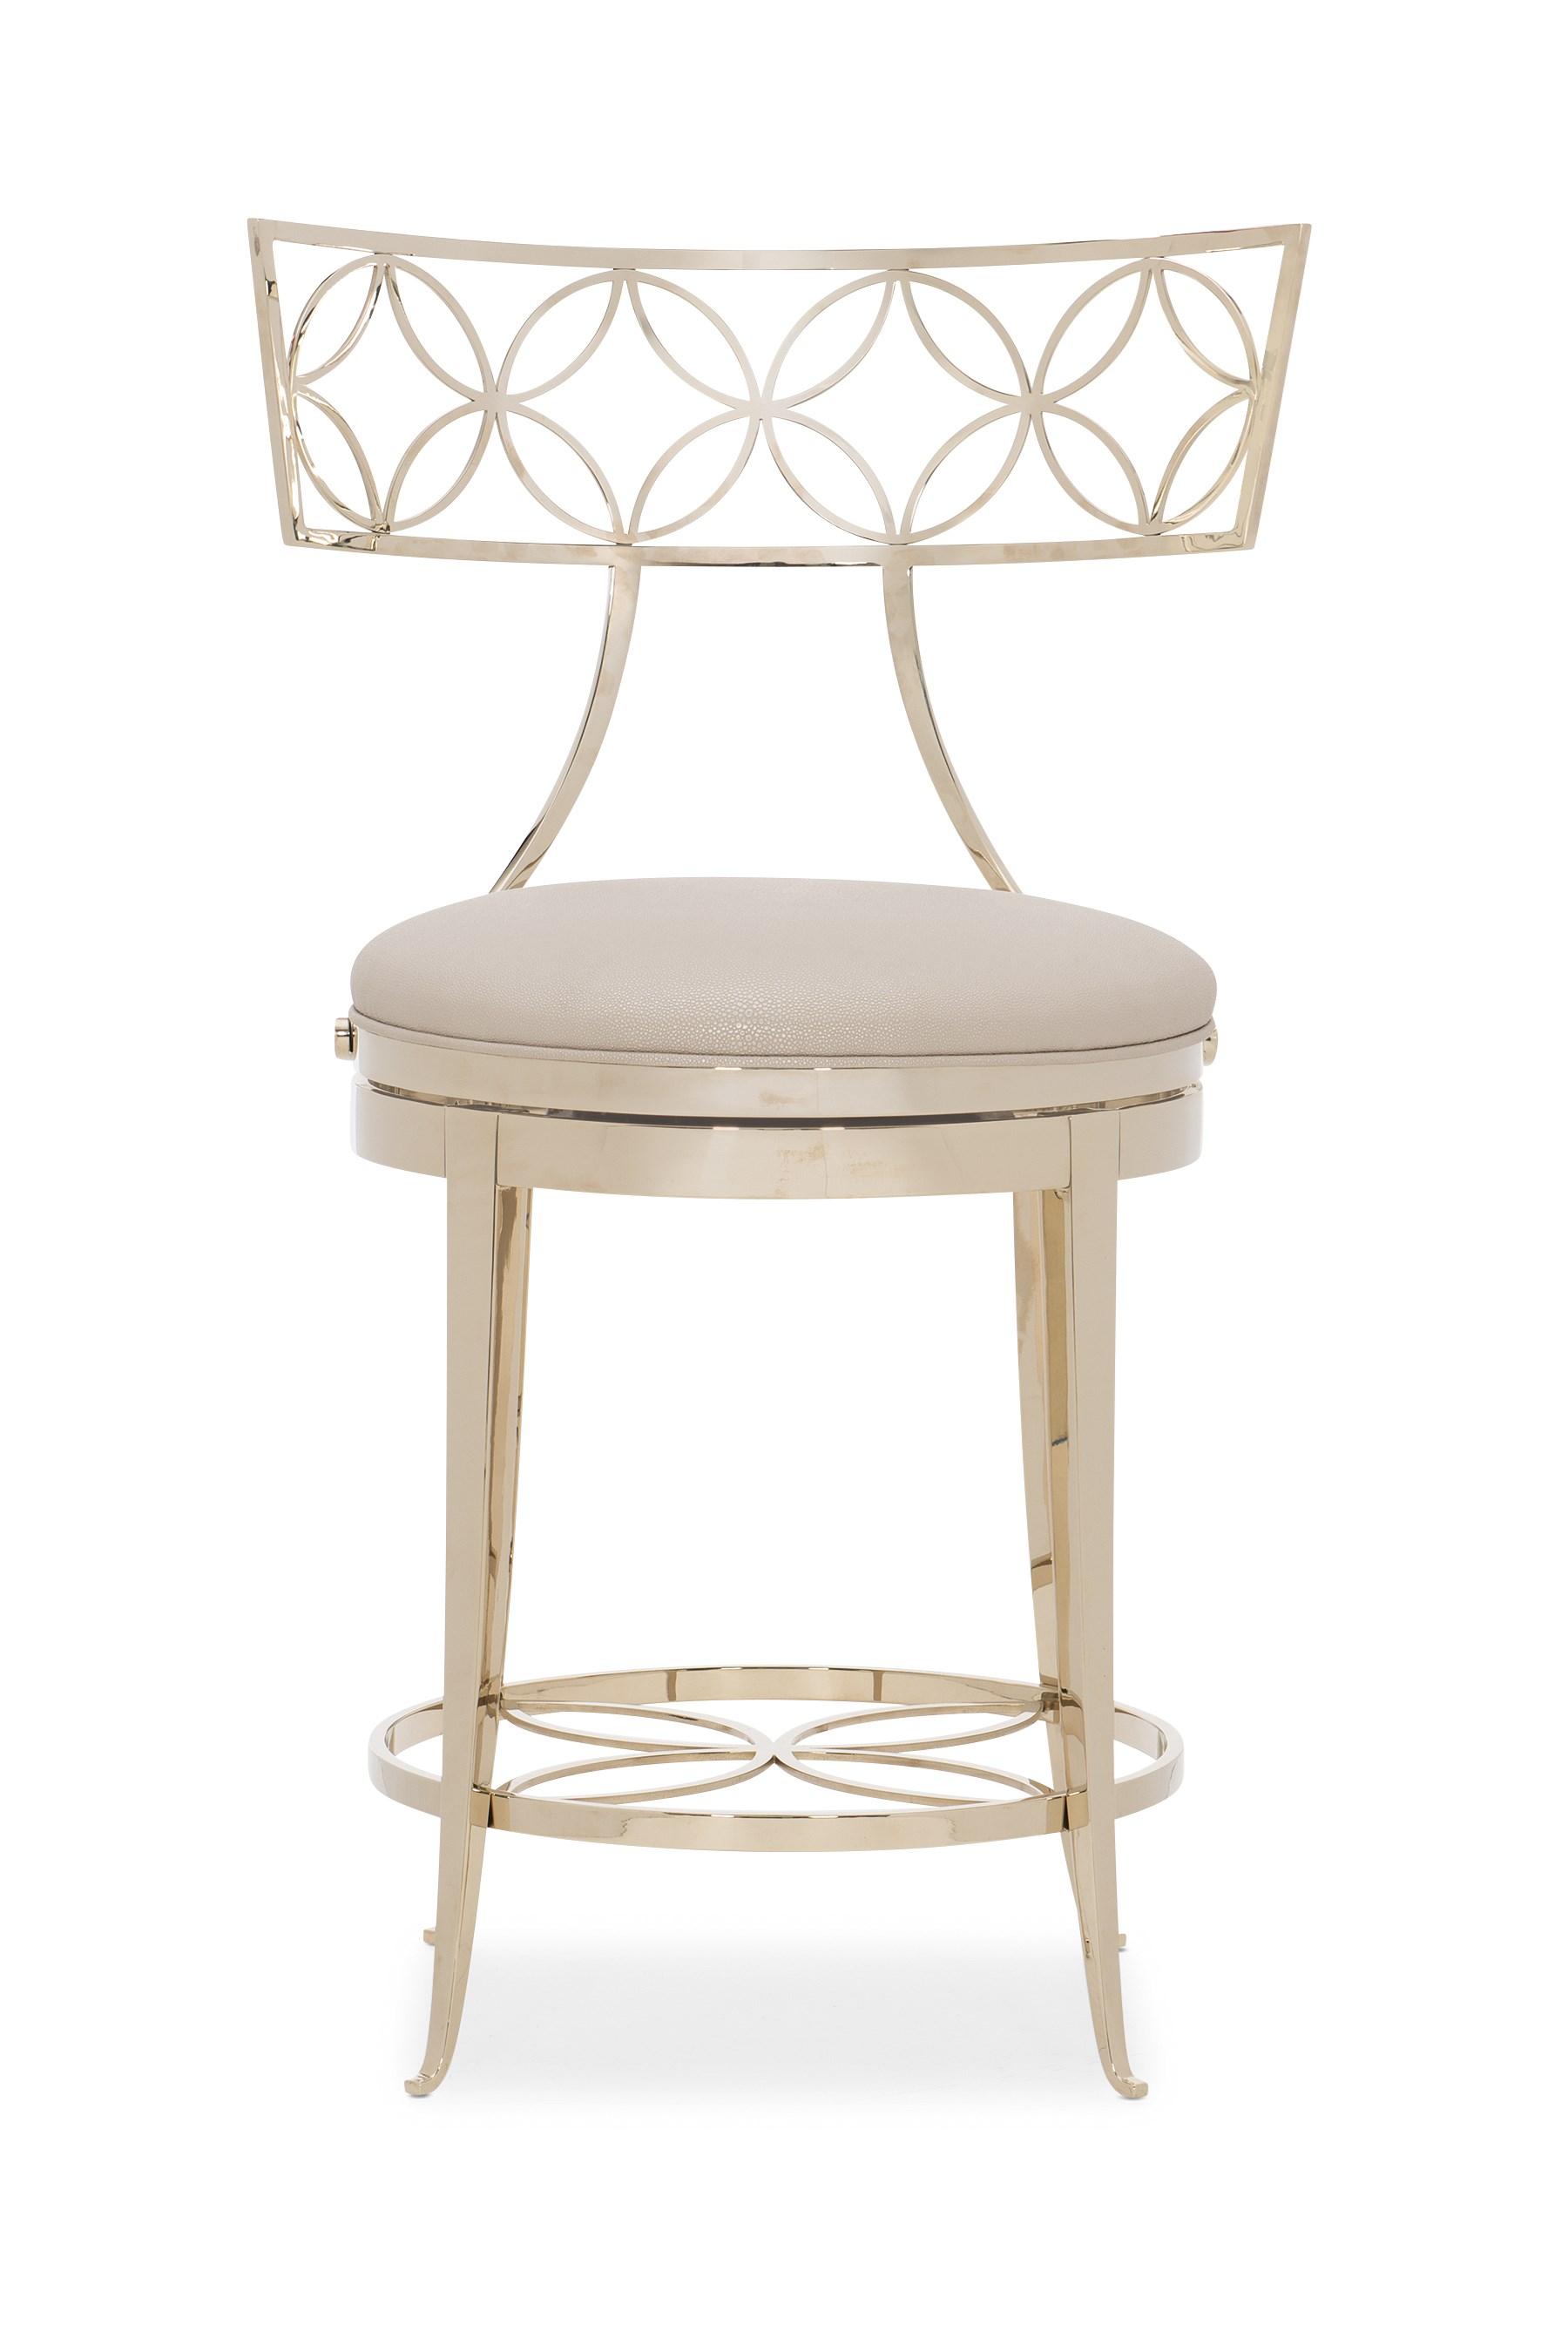 Astonishing Royal Klismos At The Counter Caracole Inzonedesignstudio Interior Chair Design Inzonedesignstudiocom